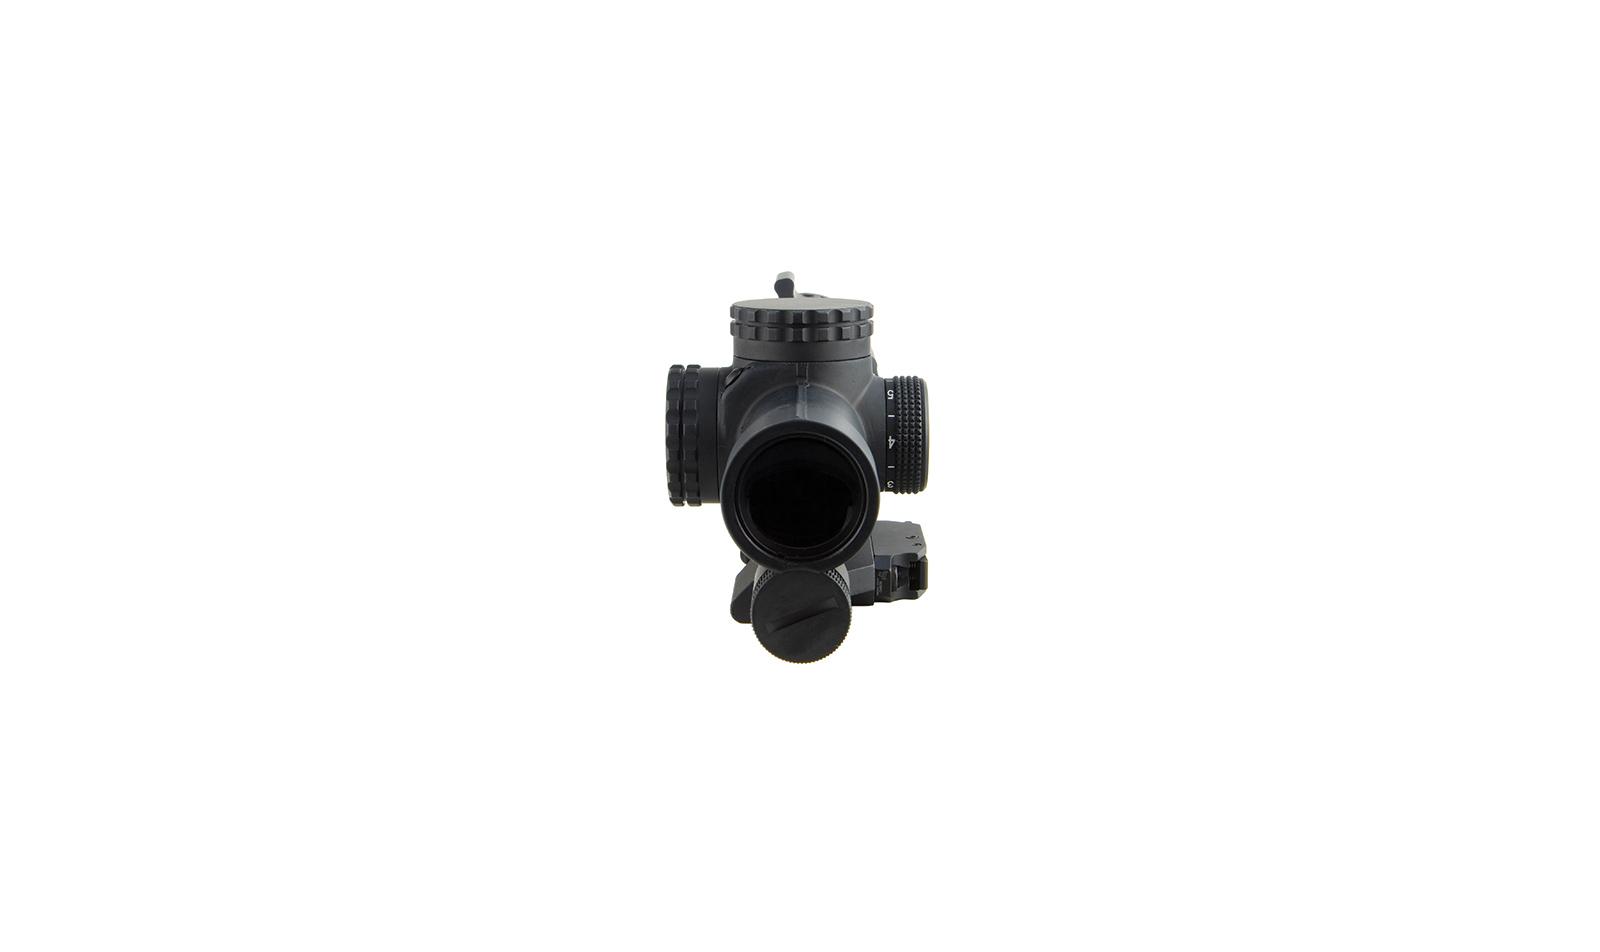 VC16-C-1600051 angle 8